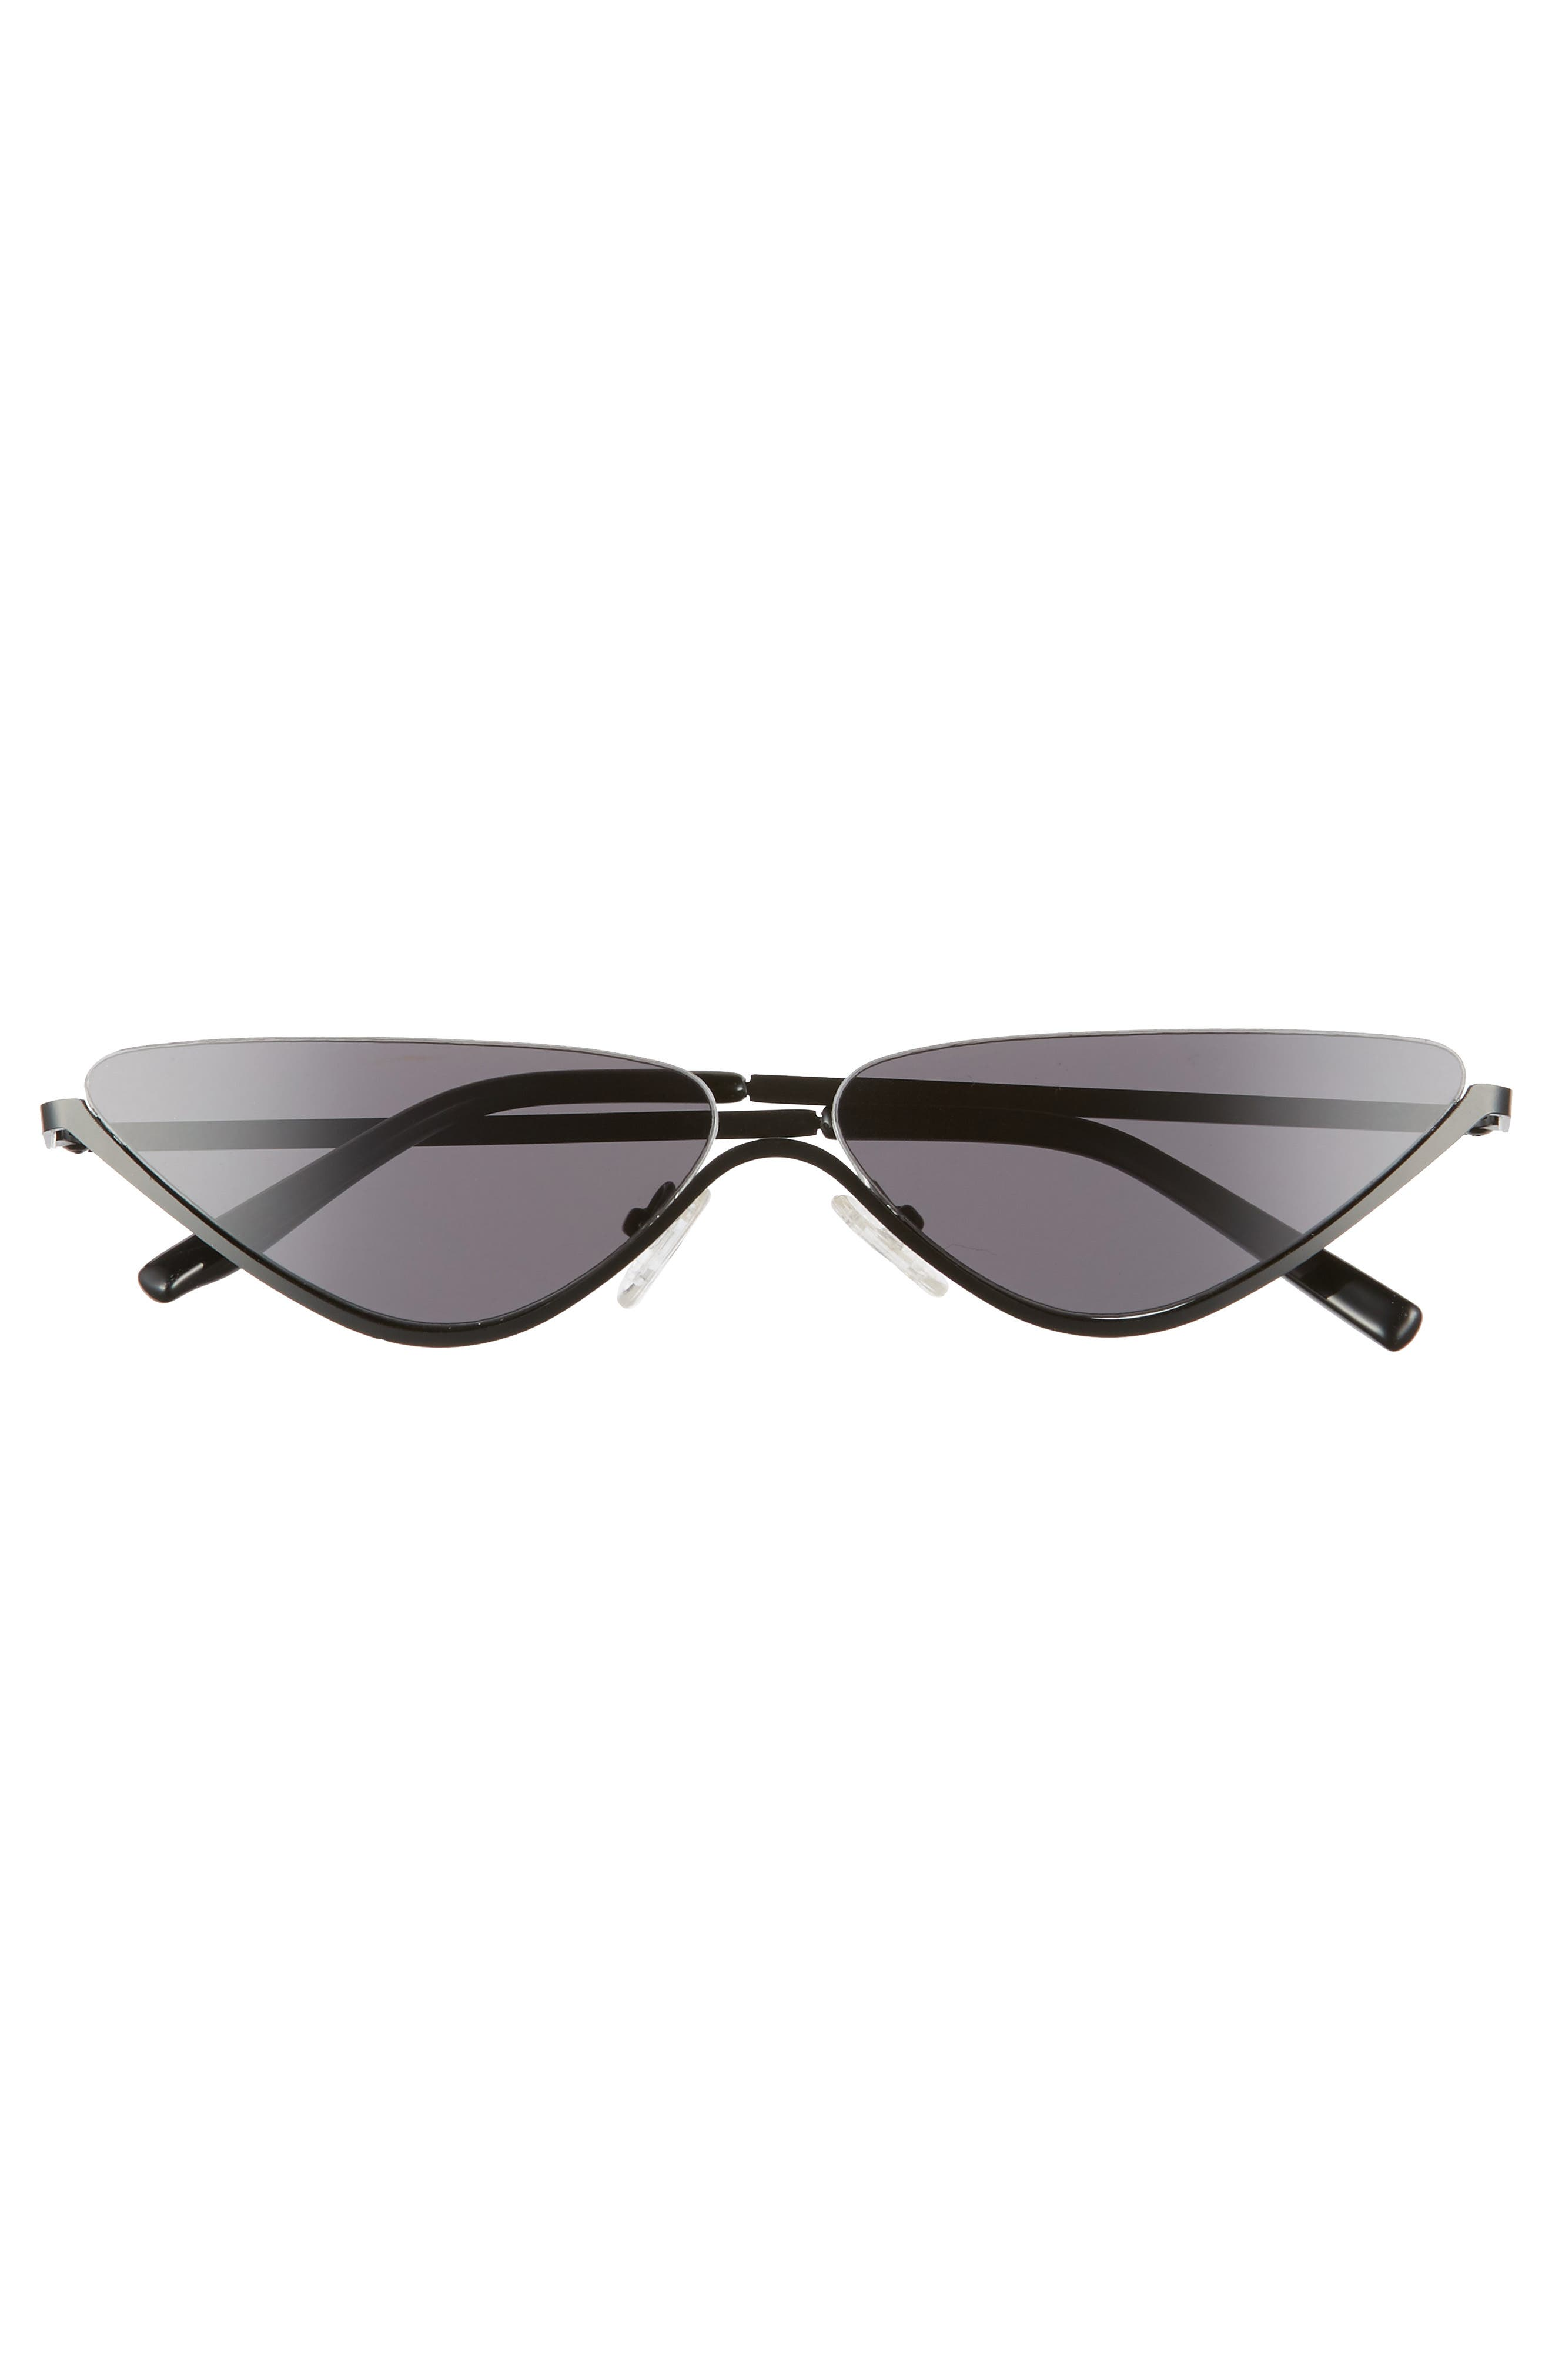 62mm Half Rim Cat Eye Sunglasses,                             Alternate thumbnail 3, color,                             001